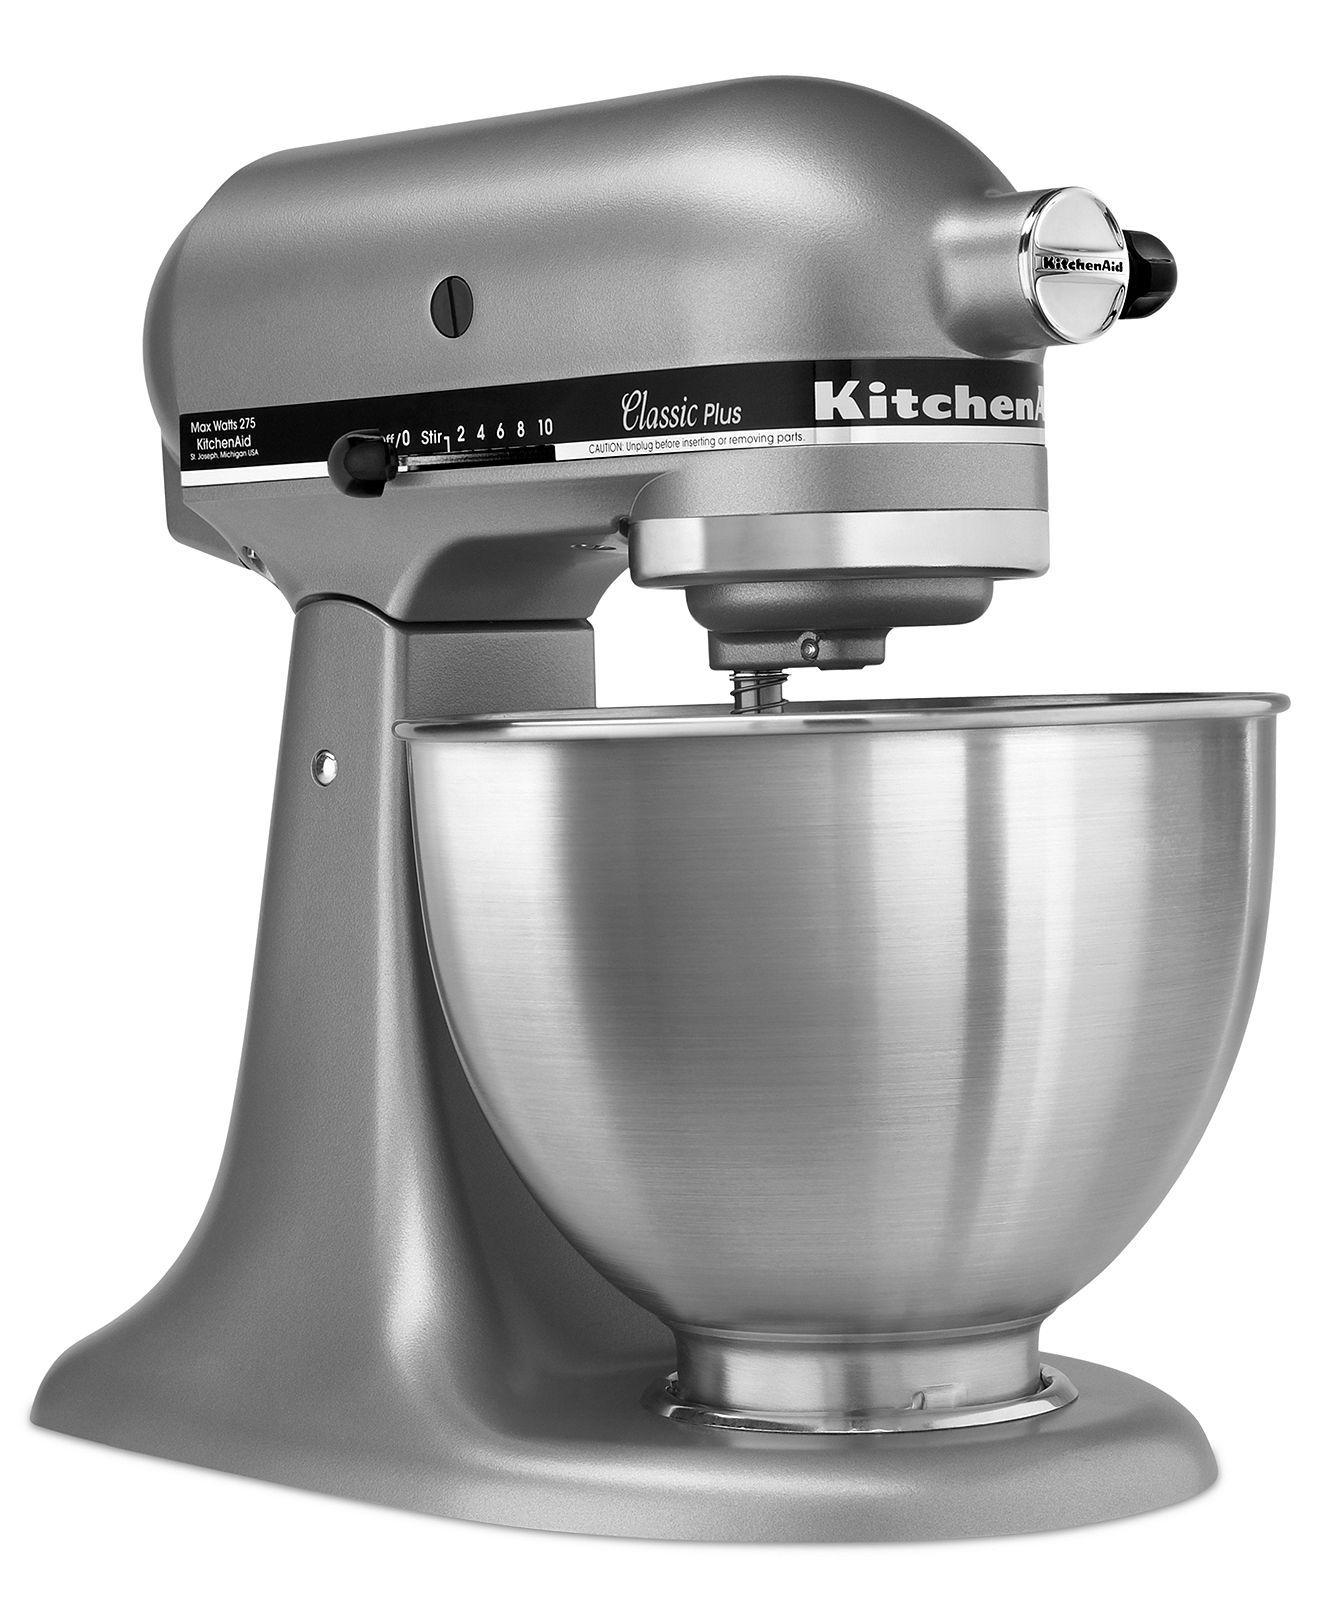 Ksm75sl 45 qt classic plus stand mixer pinterest